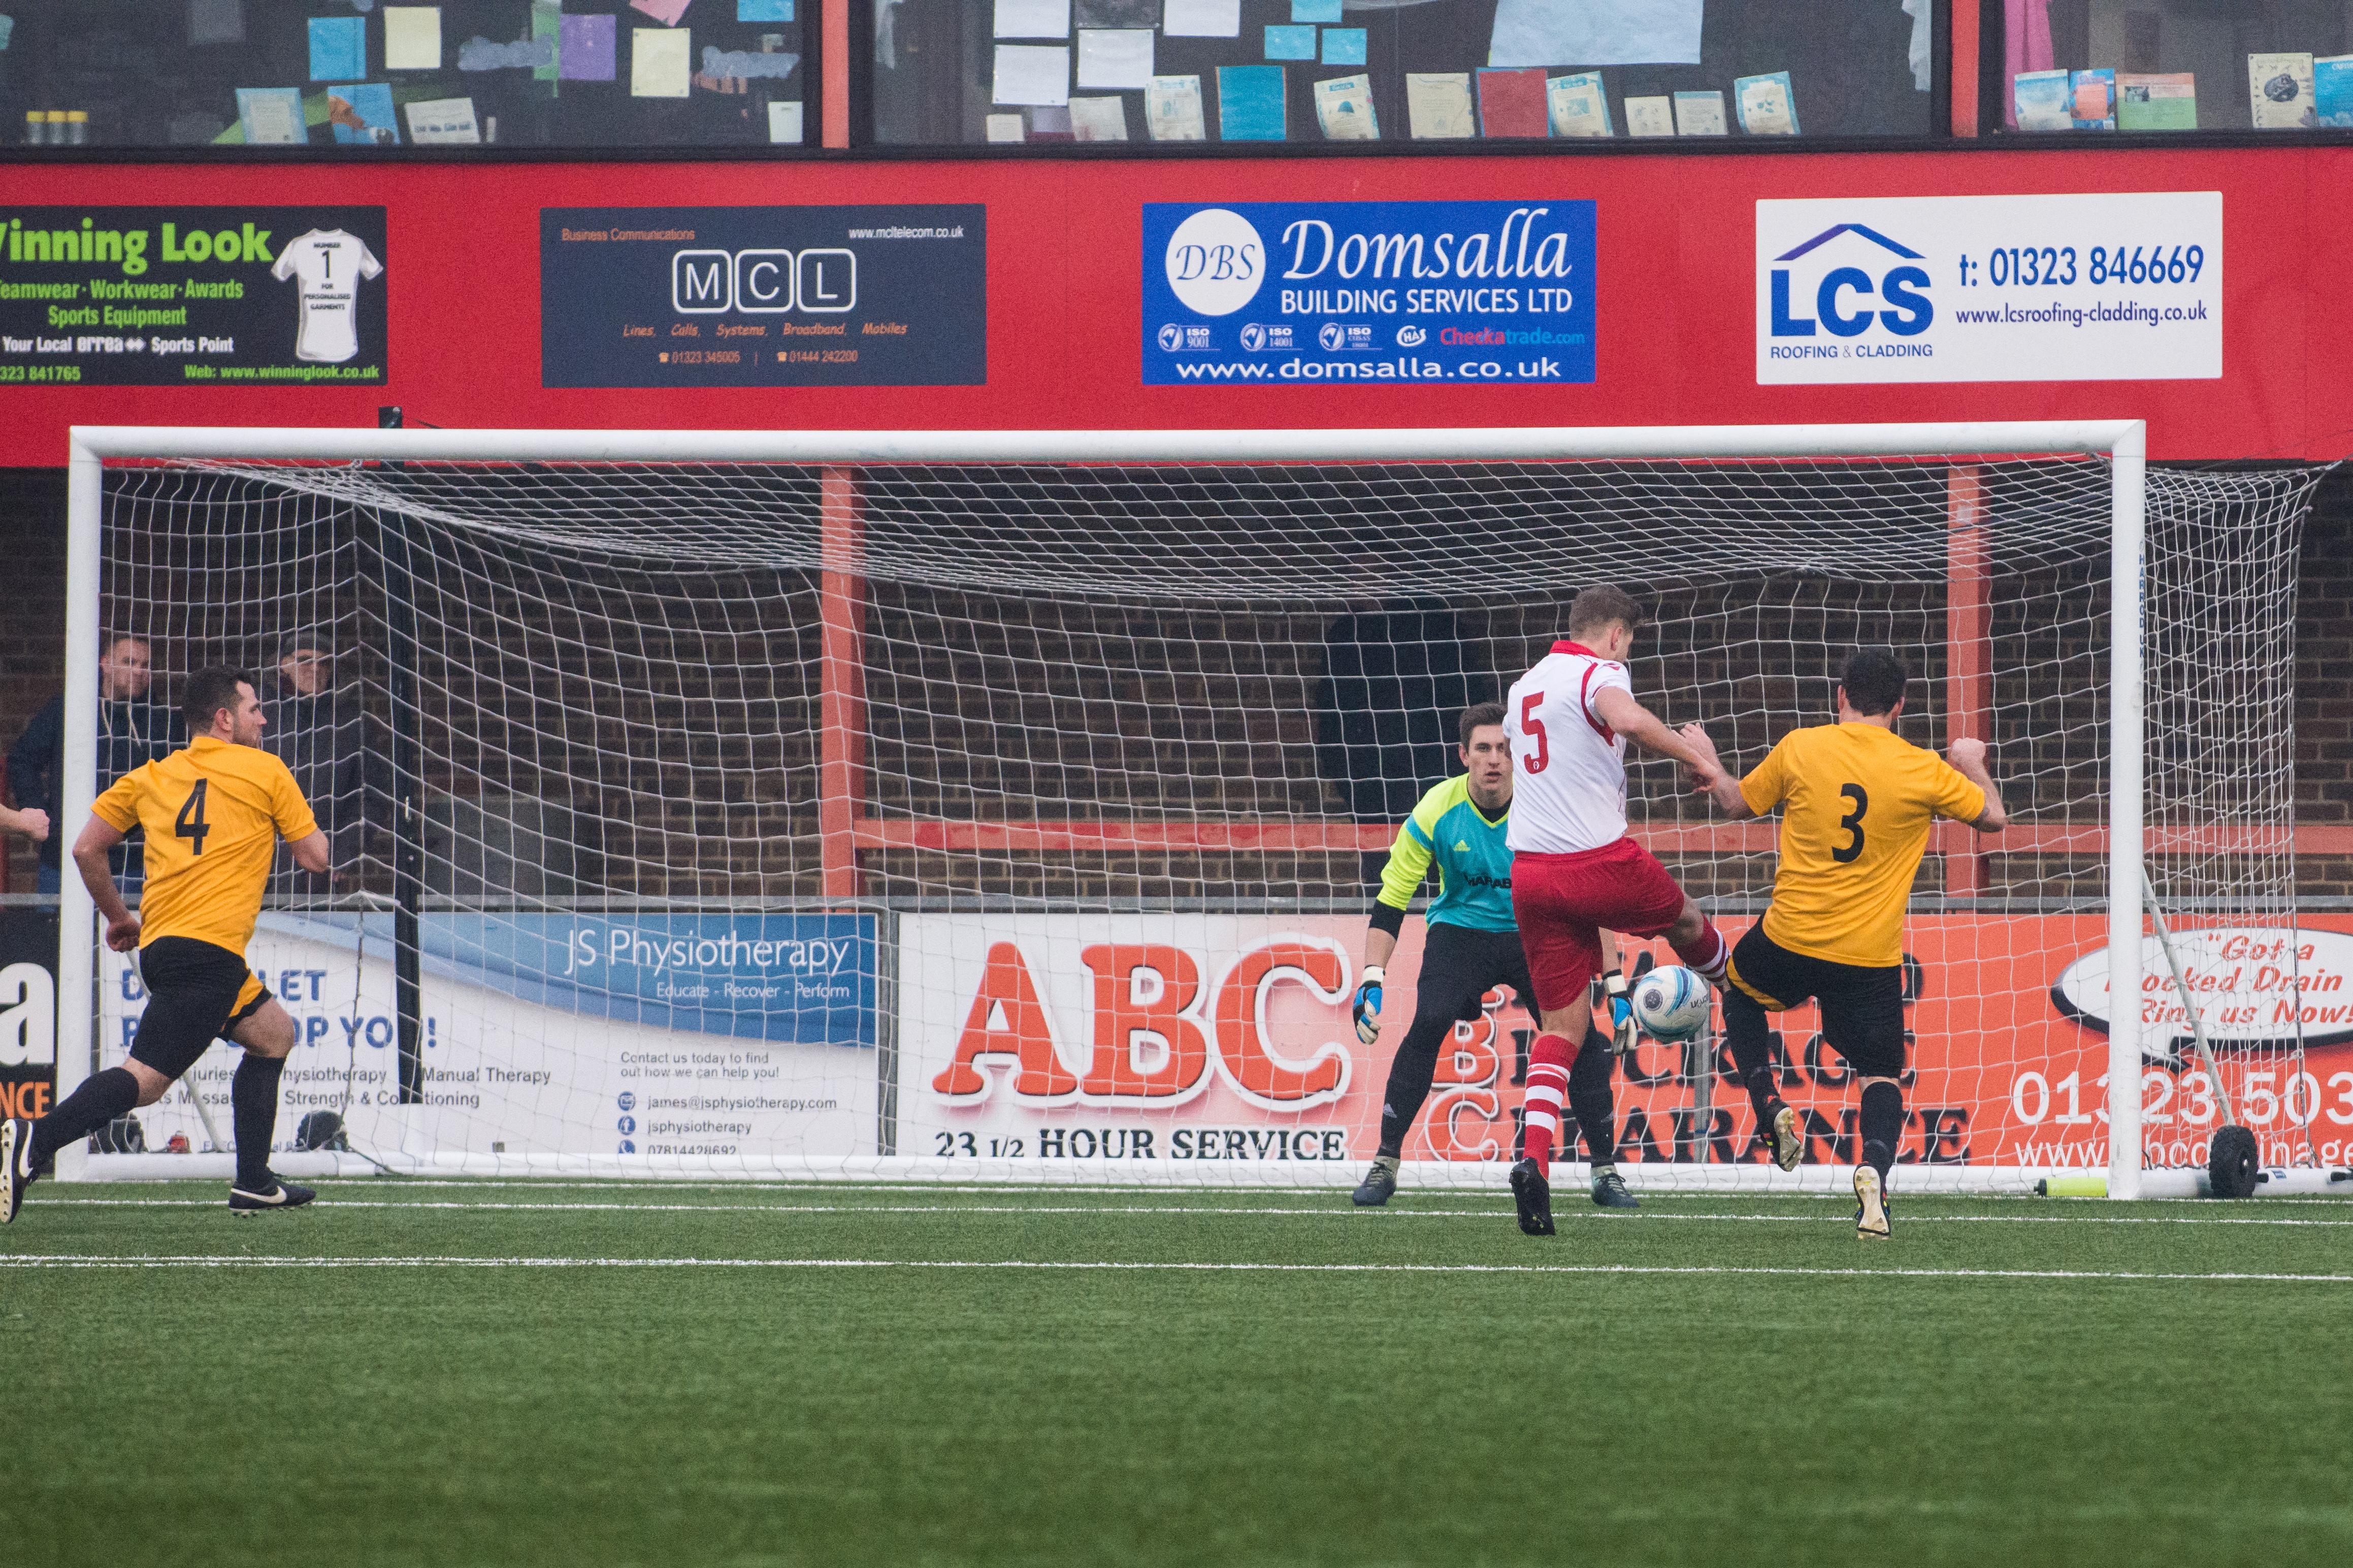 DAVID_JEFFERY Langney Wanderers FC vs Bexhill United FC 03.03.18 74